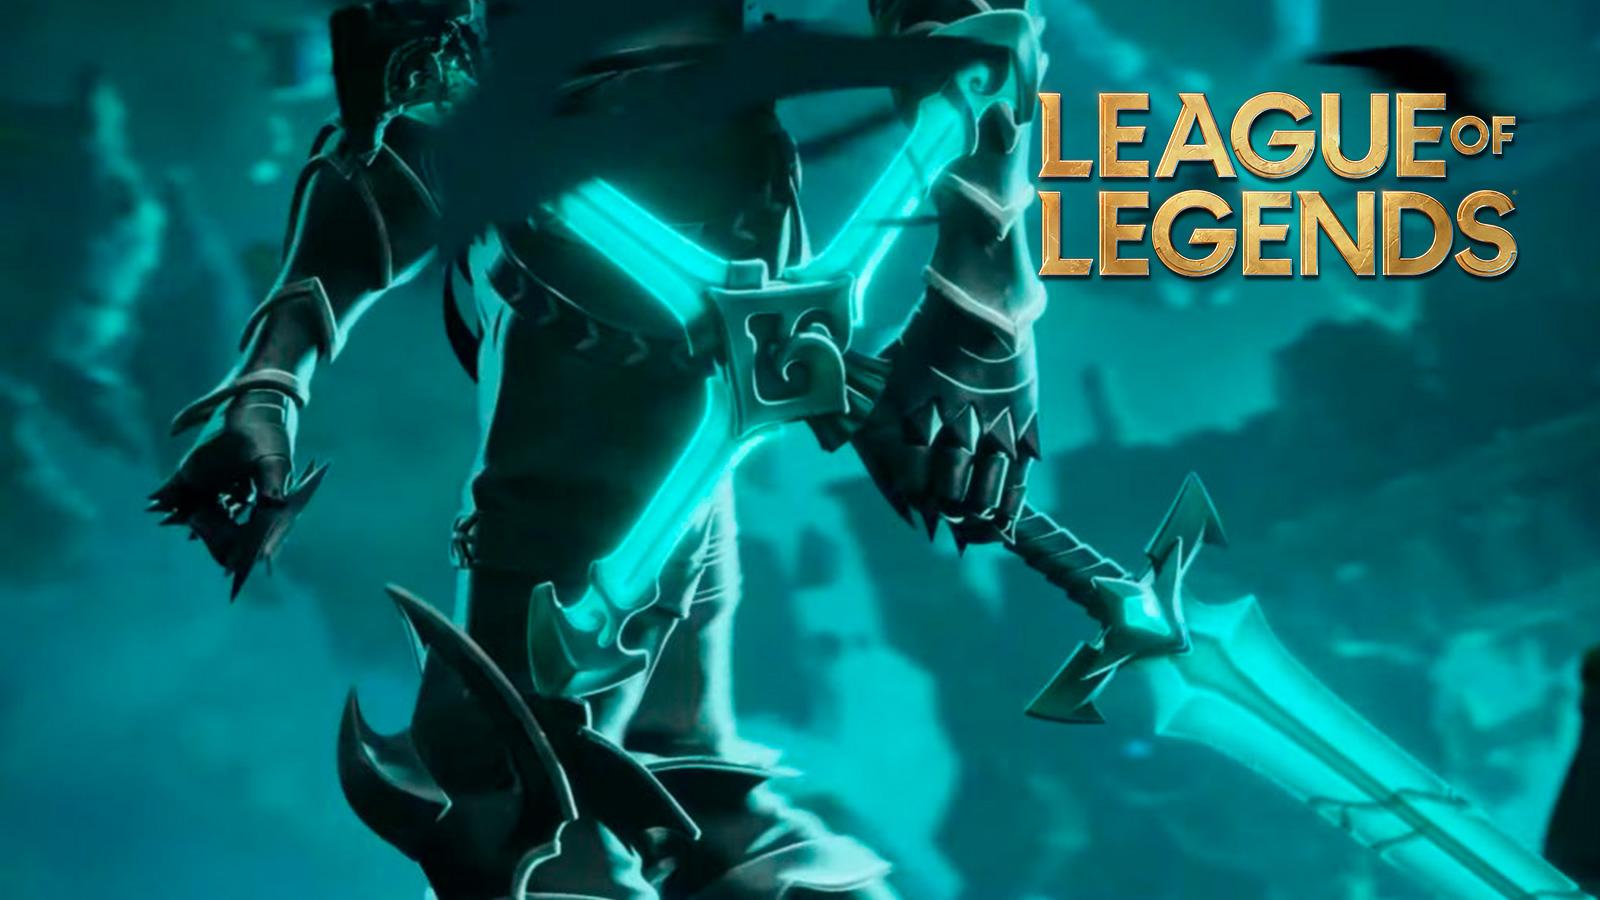 Viego League of Legends